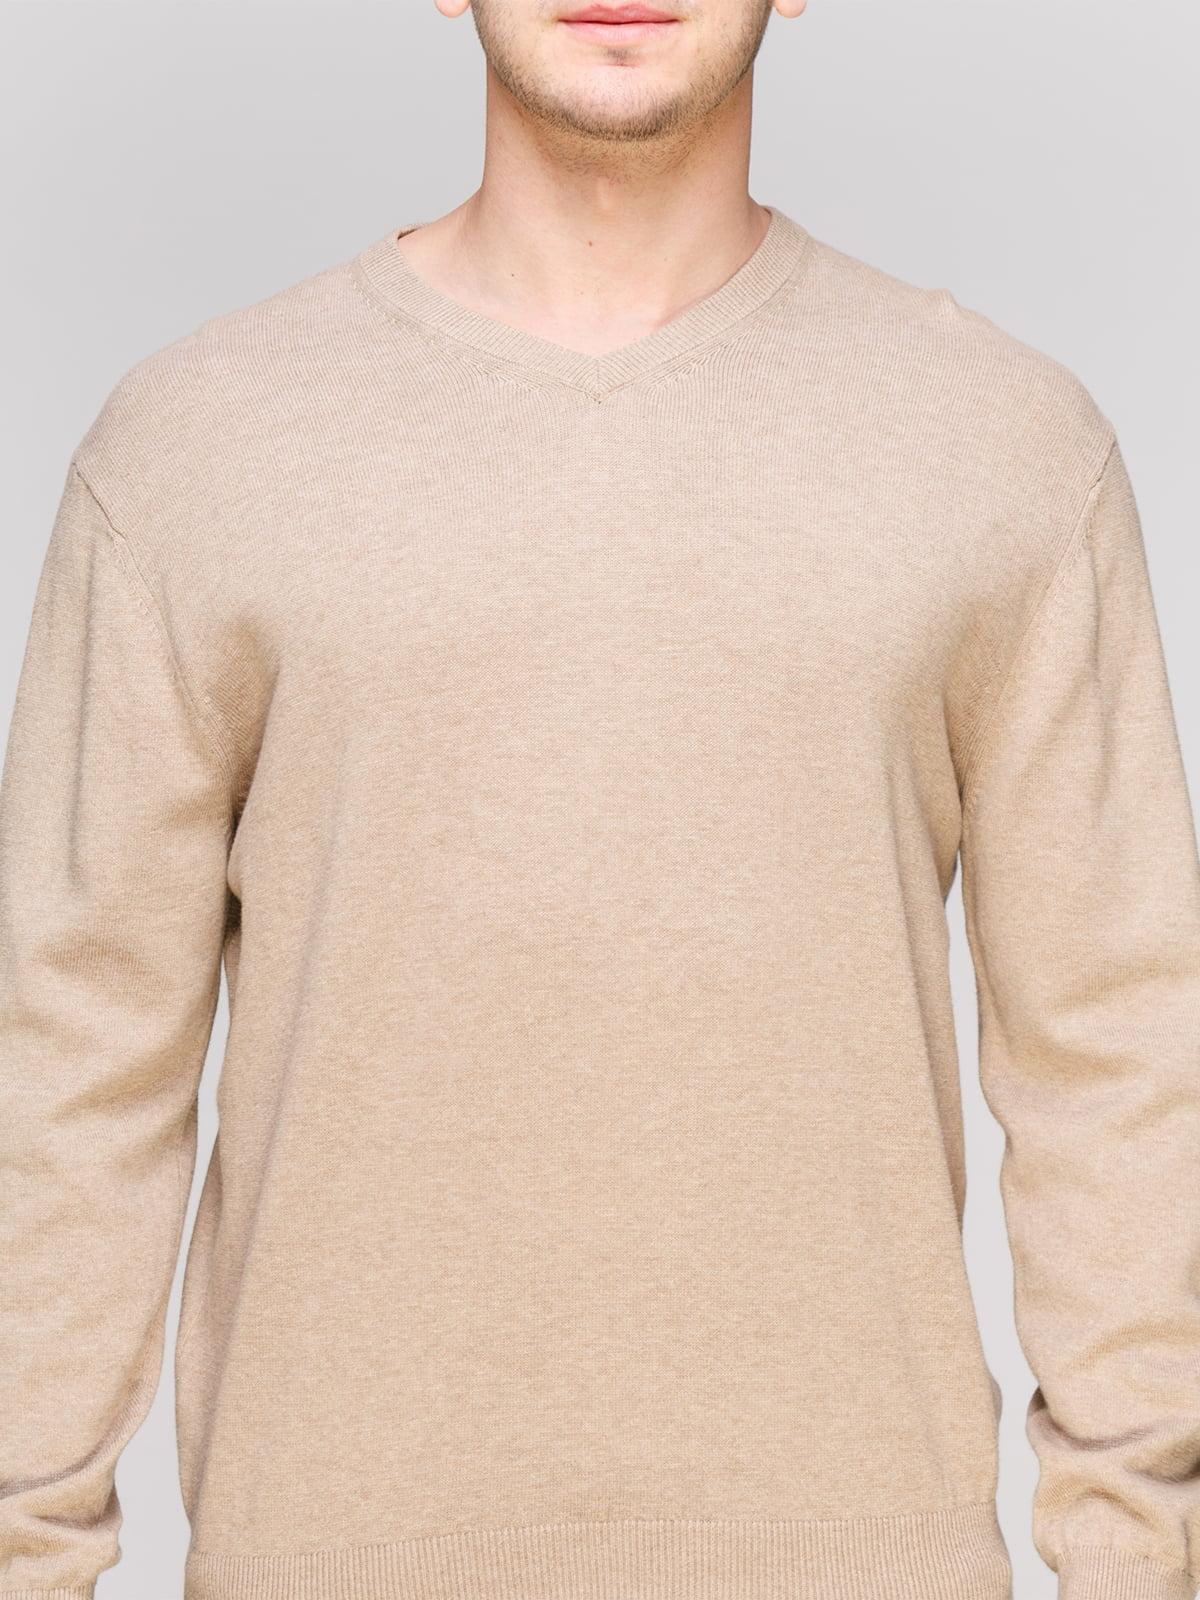 Пуловер серо-бежевого цвета   4855017   фото 3